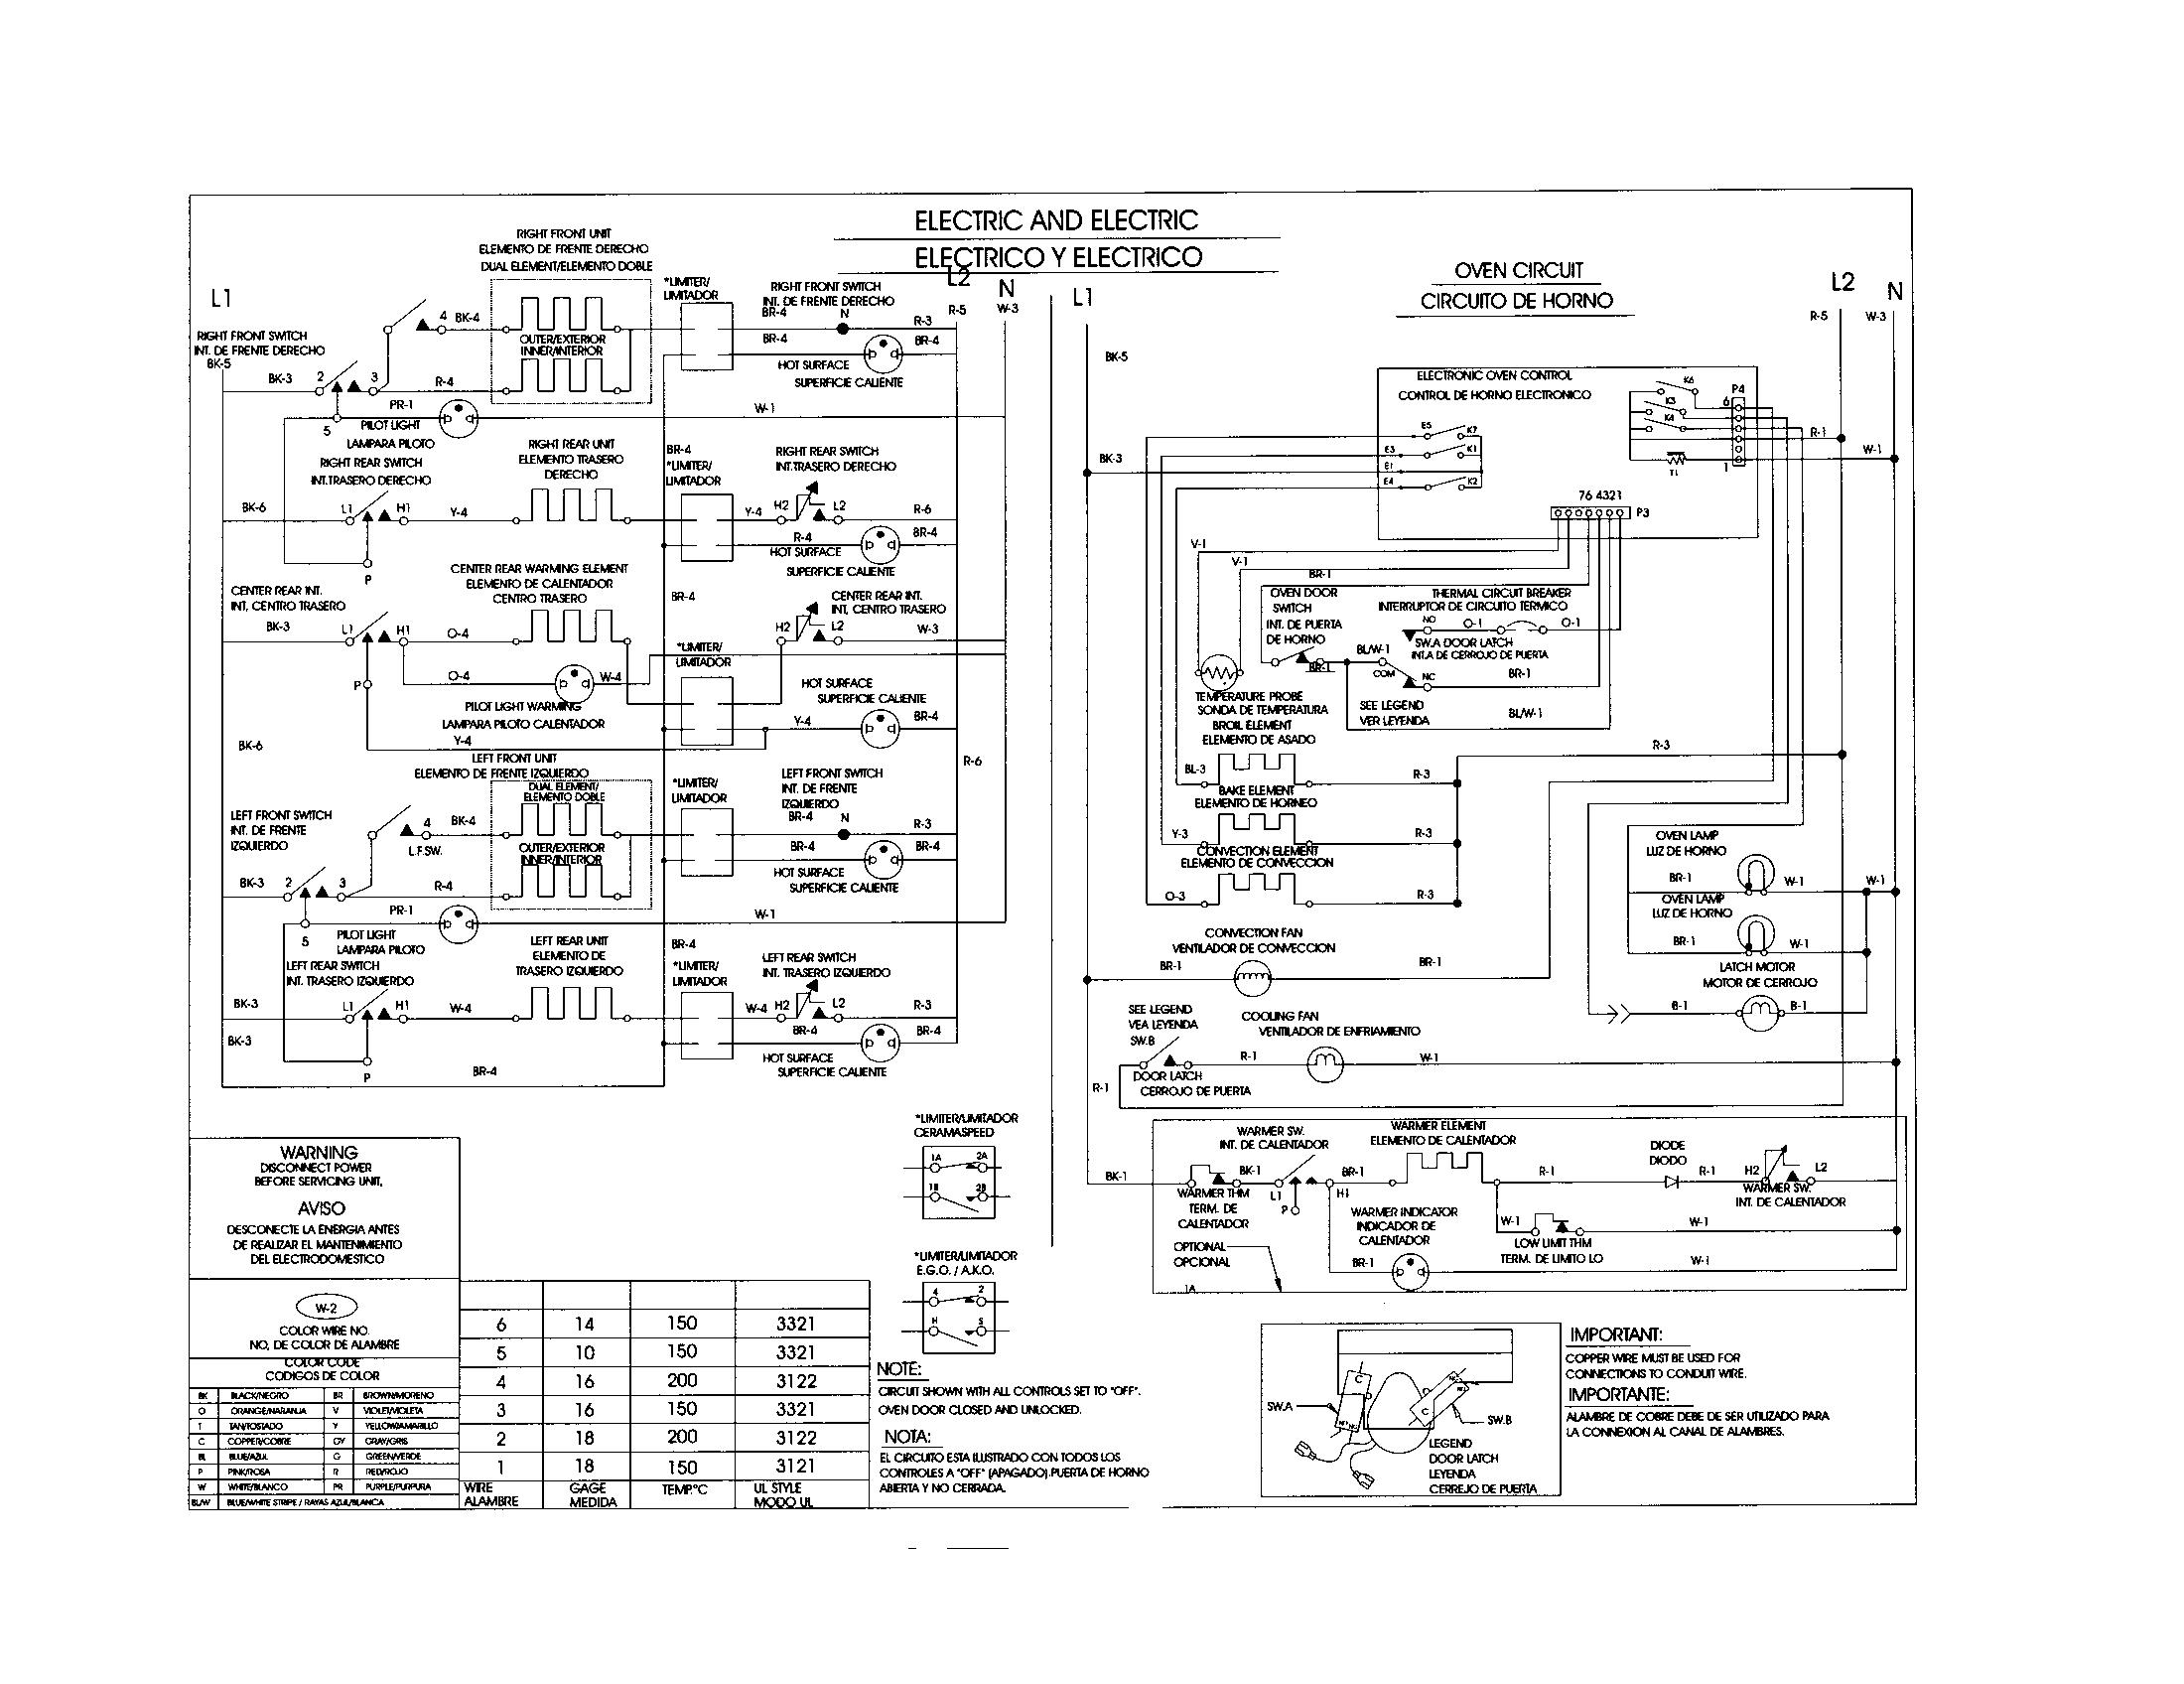 ... wiring diagram whirlpool wall oven gbd307 gold gandul 45 77 79 119 bosch double oven wiring  sc 1 st  MiFinder : bosch dishwasher wiring - yogabreezes.com